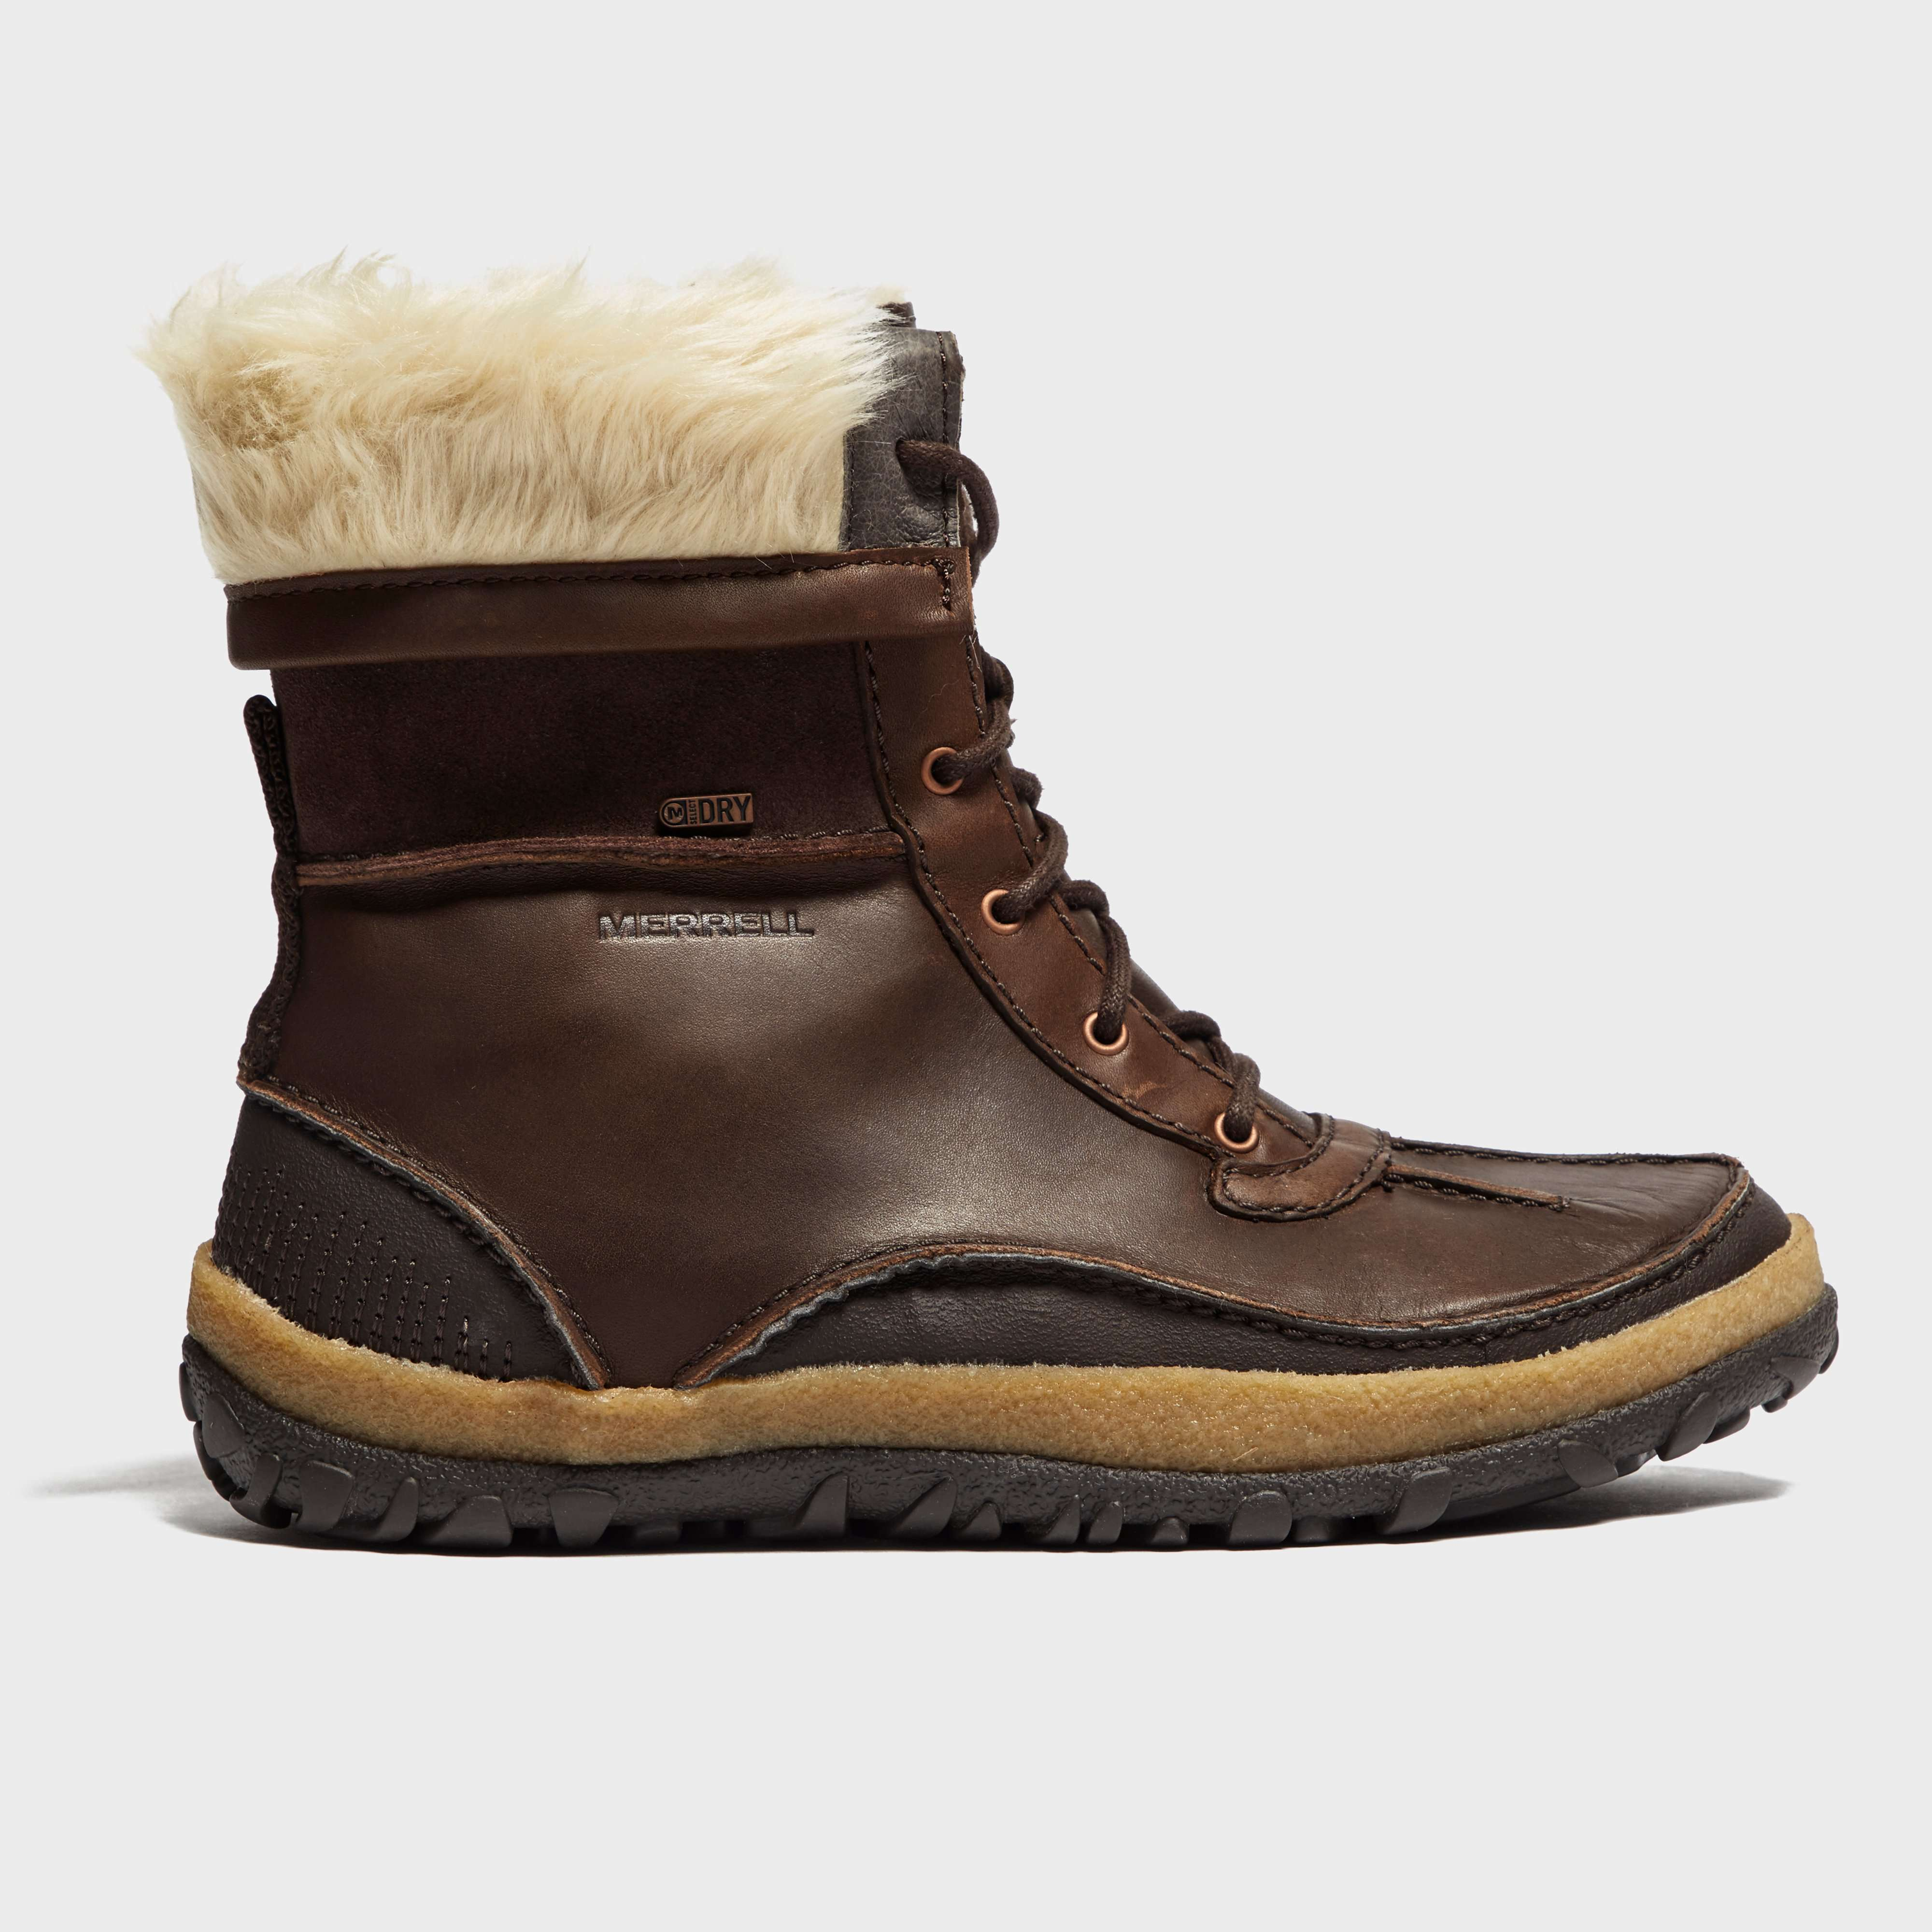 MERRELL Women's Tremblant Winter Mid Boot